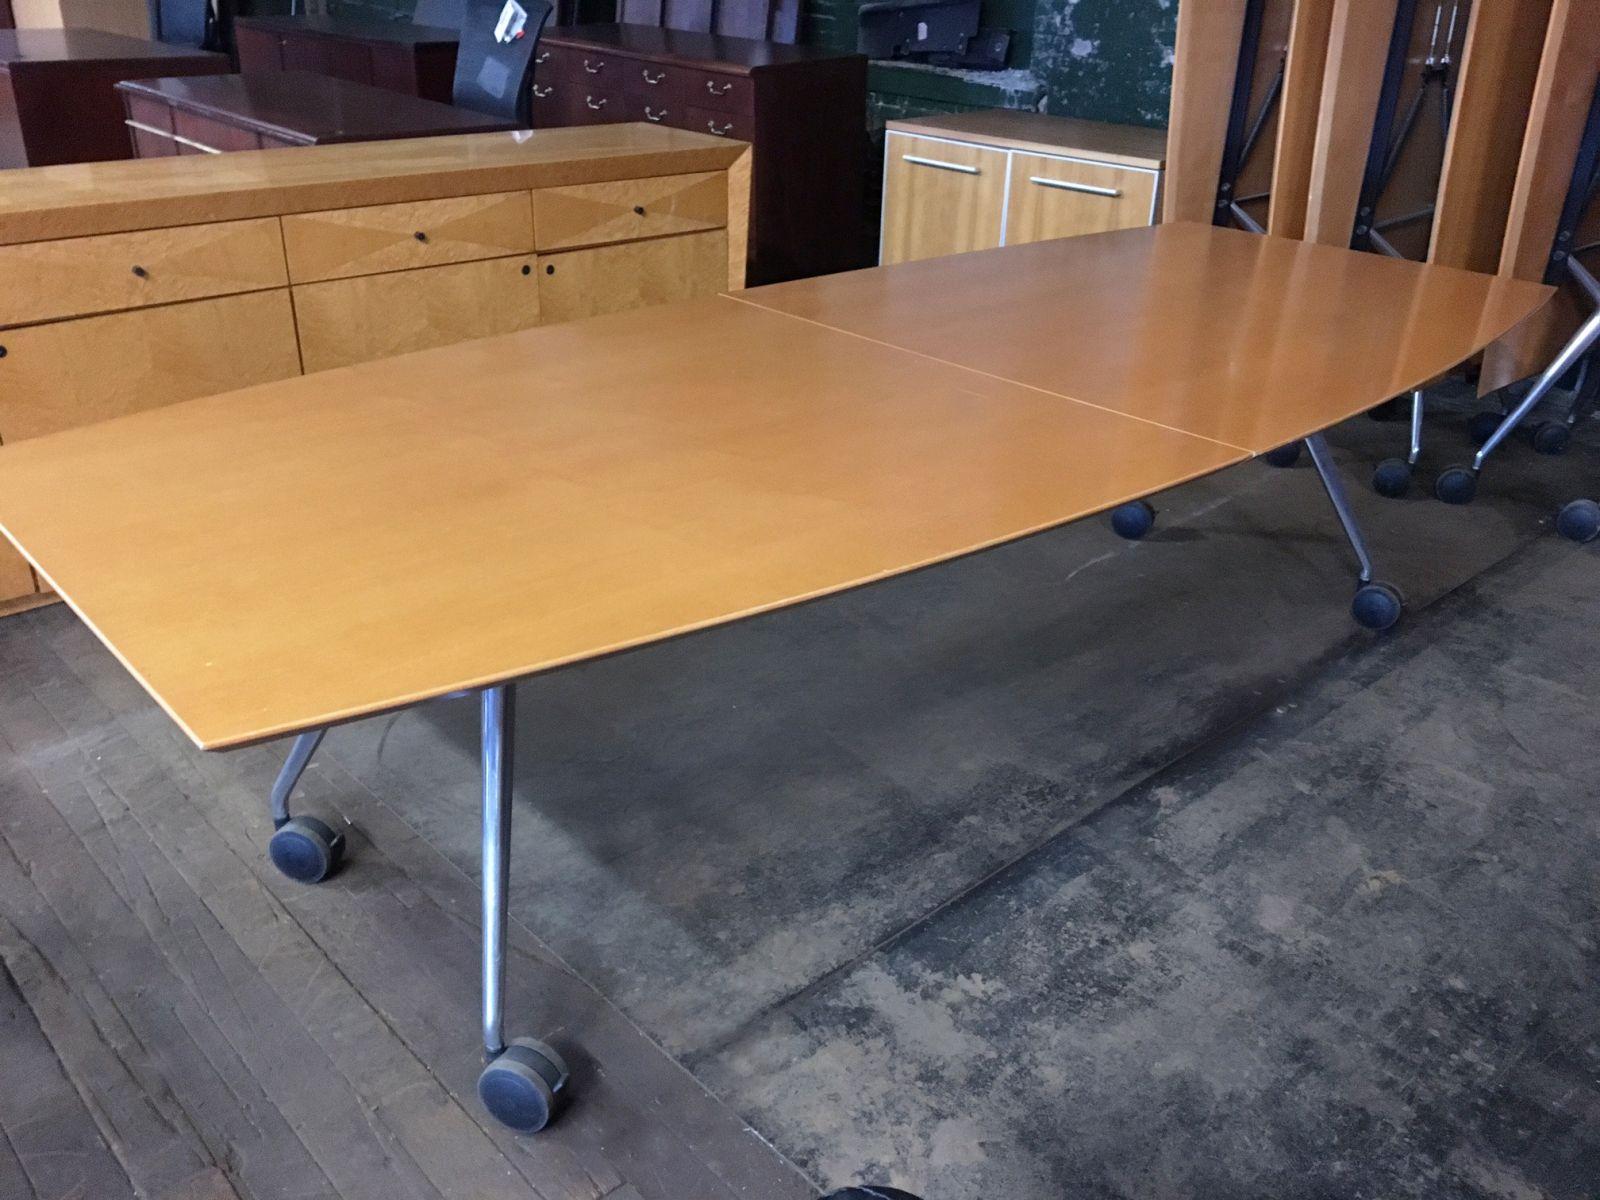 Kimball Aspire Meeting Tables